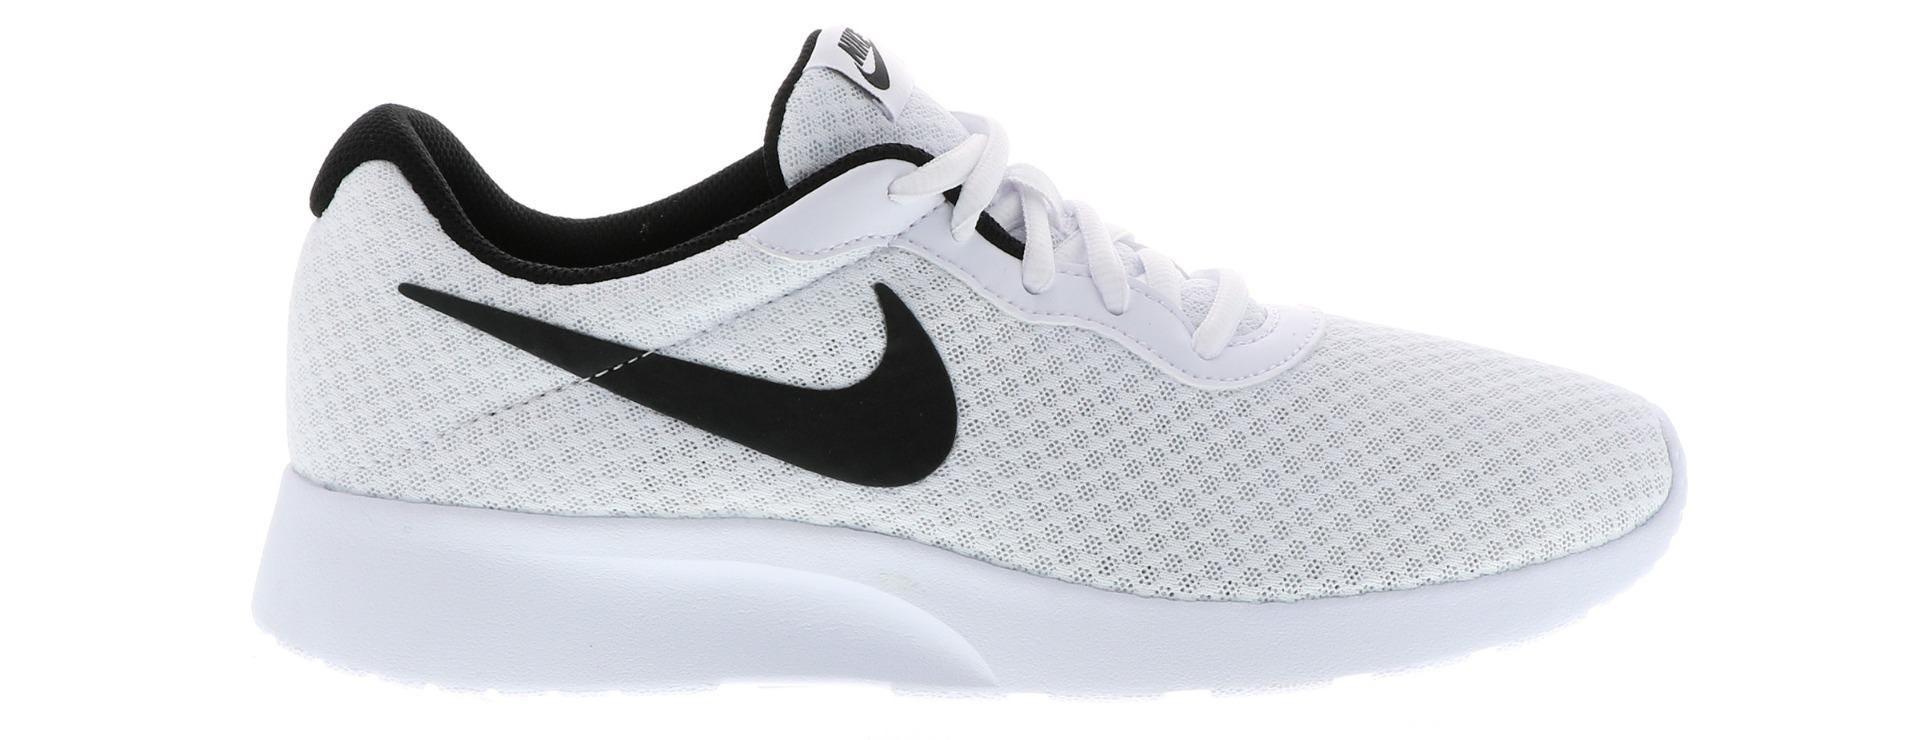 design intemporel 370d4 7e6d4 Men's Nike Tanjun